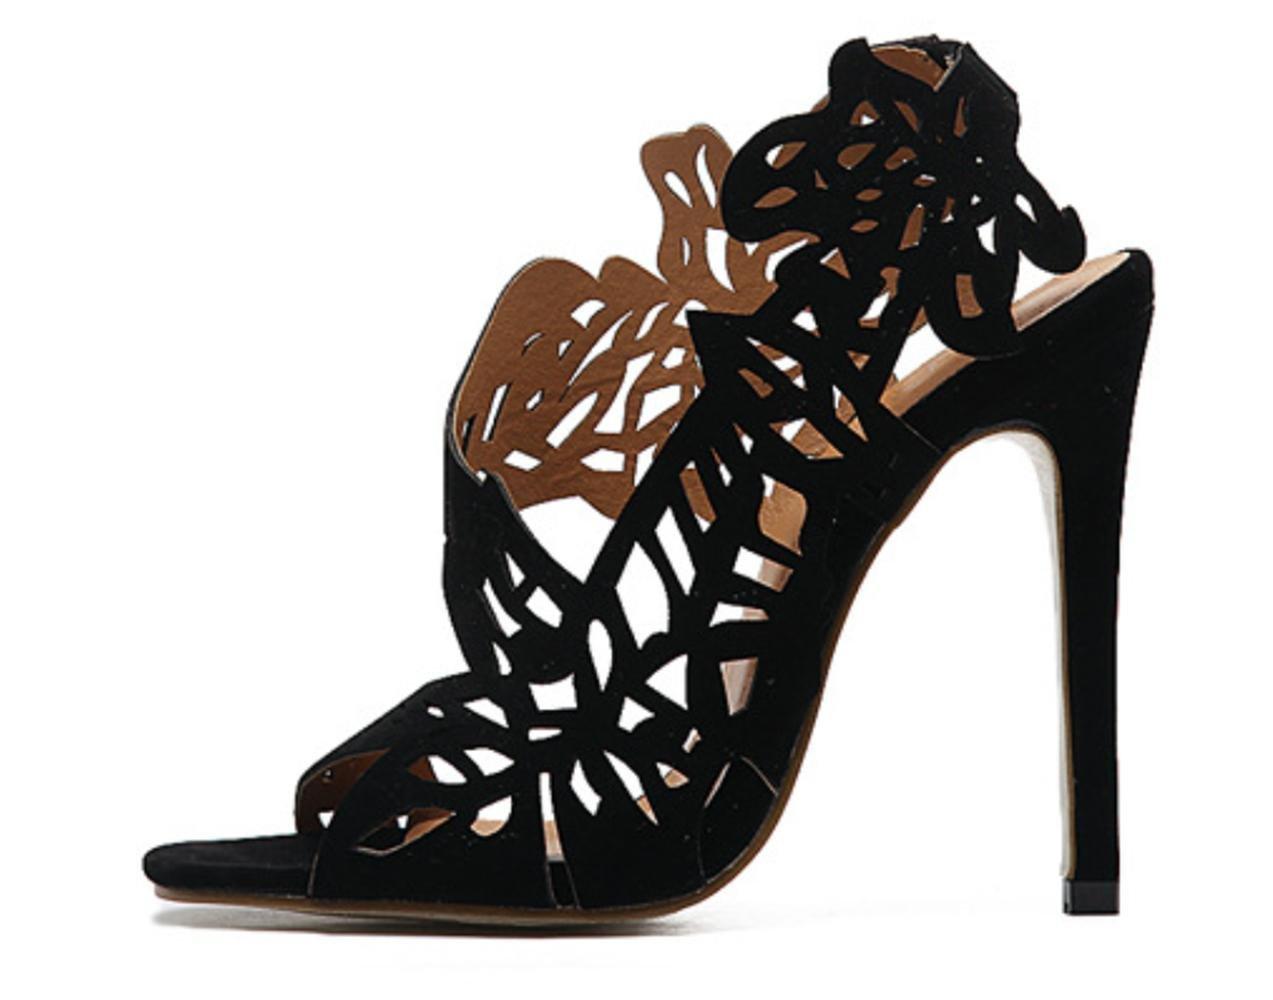 Frauen Stiletto High-Heels Ferse Hohle Mode Breathable High-Heels Stiletto Sandalen Klassische Sommer Casual Single Schuhe - ef1347